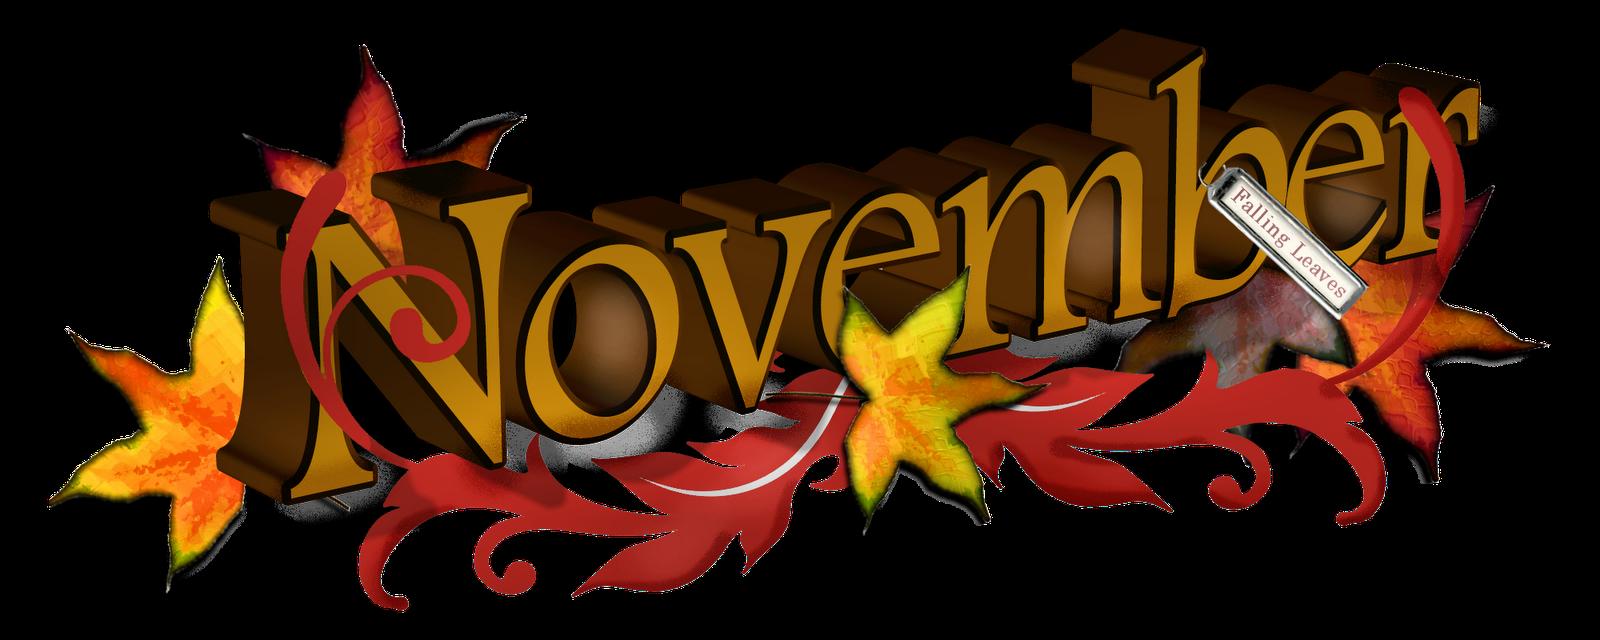 Free November Clipart - November Clipart